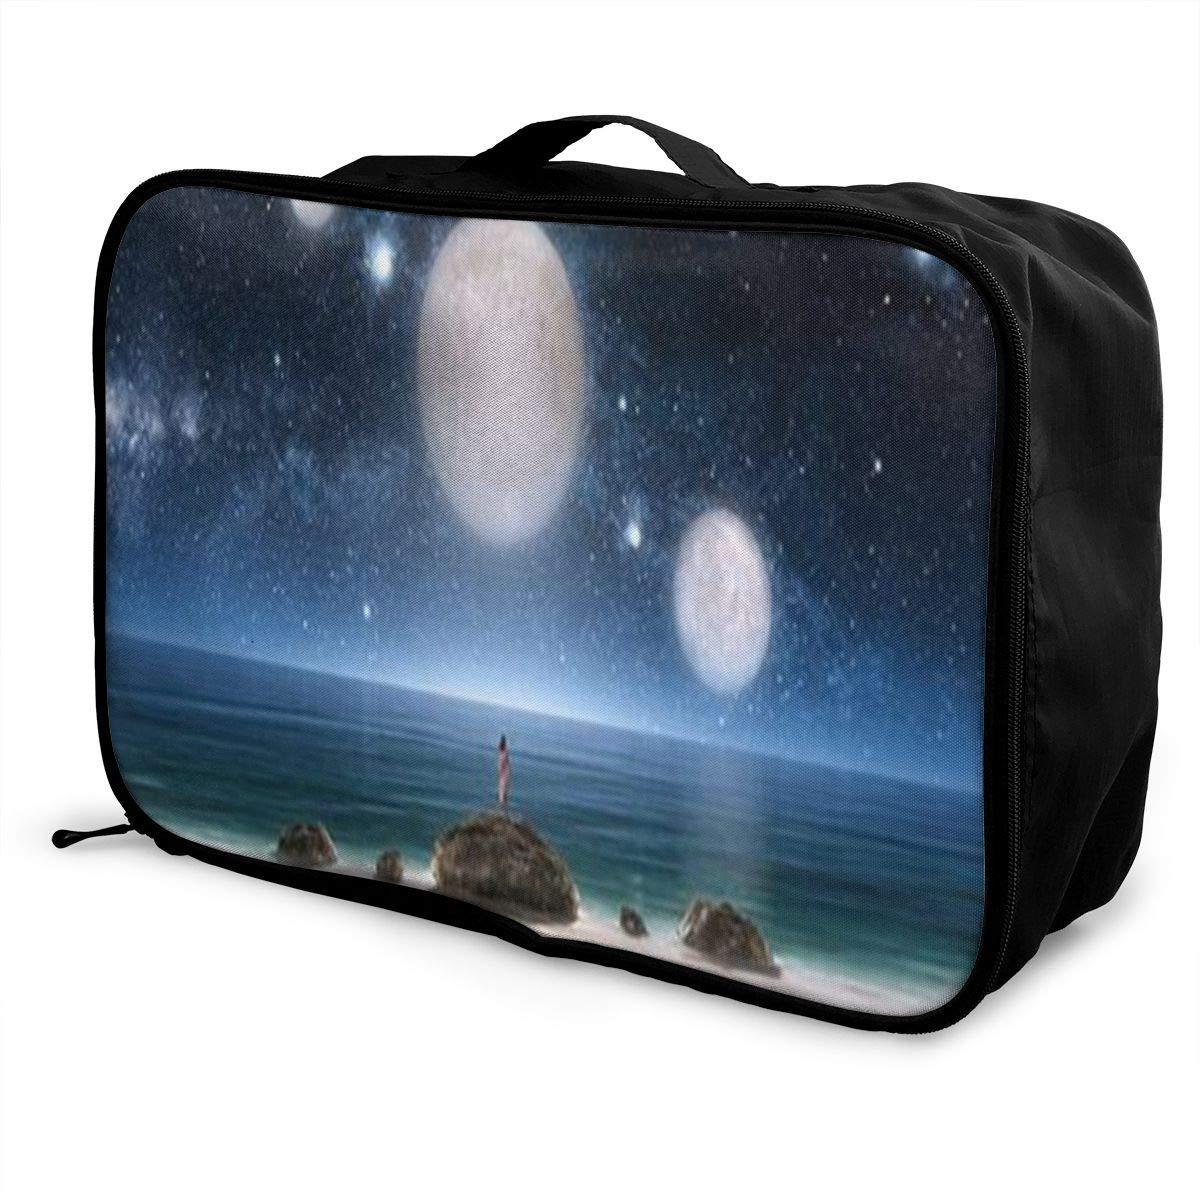 Travel Luggage Duffle Bag Lightweight Portable Handbag Fantasy Sky Print Large Capacity Waterproof Foldable Storage Tote